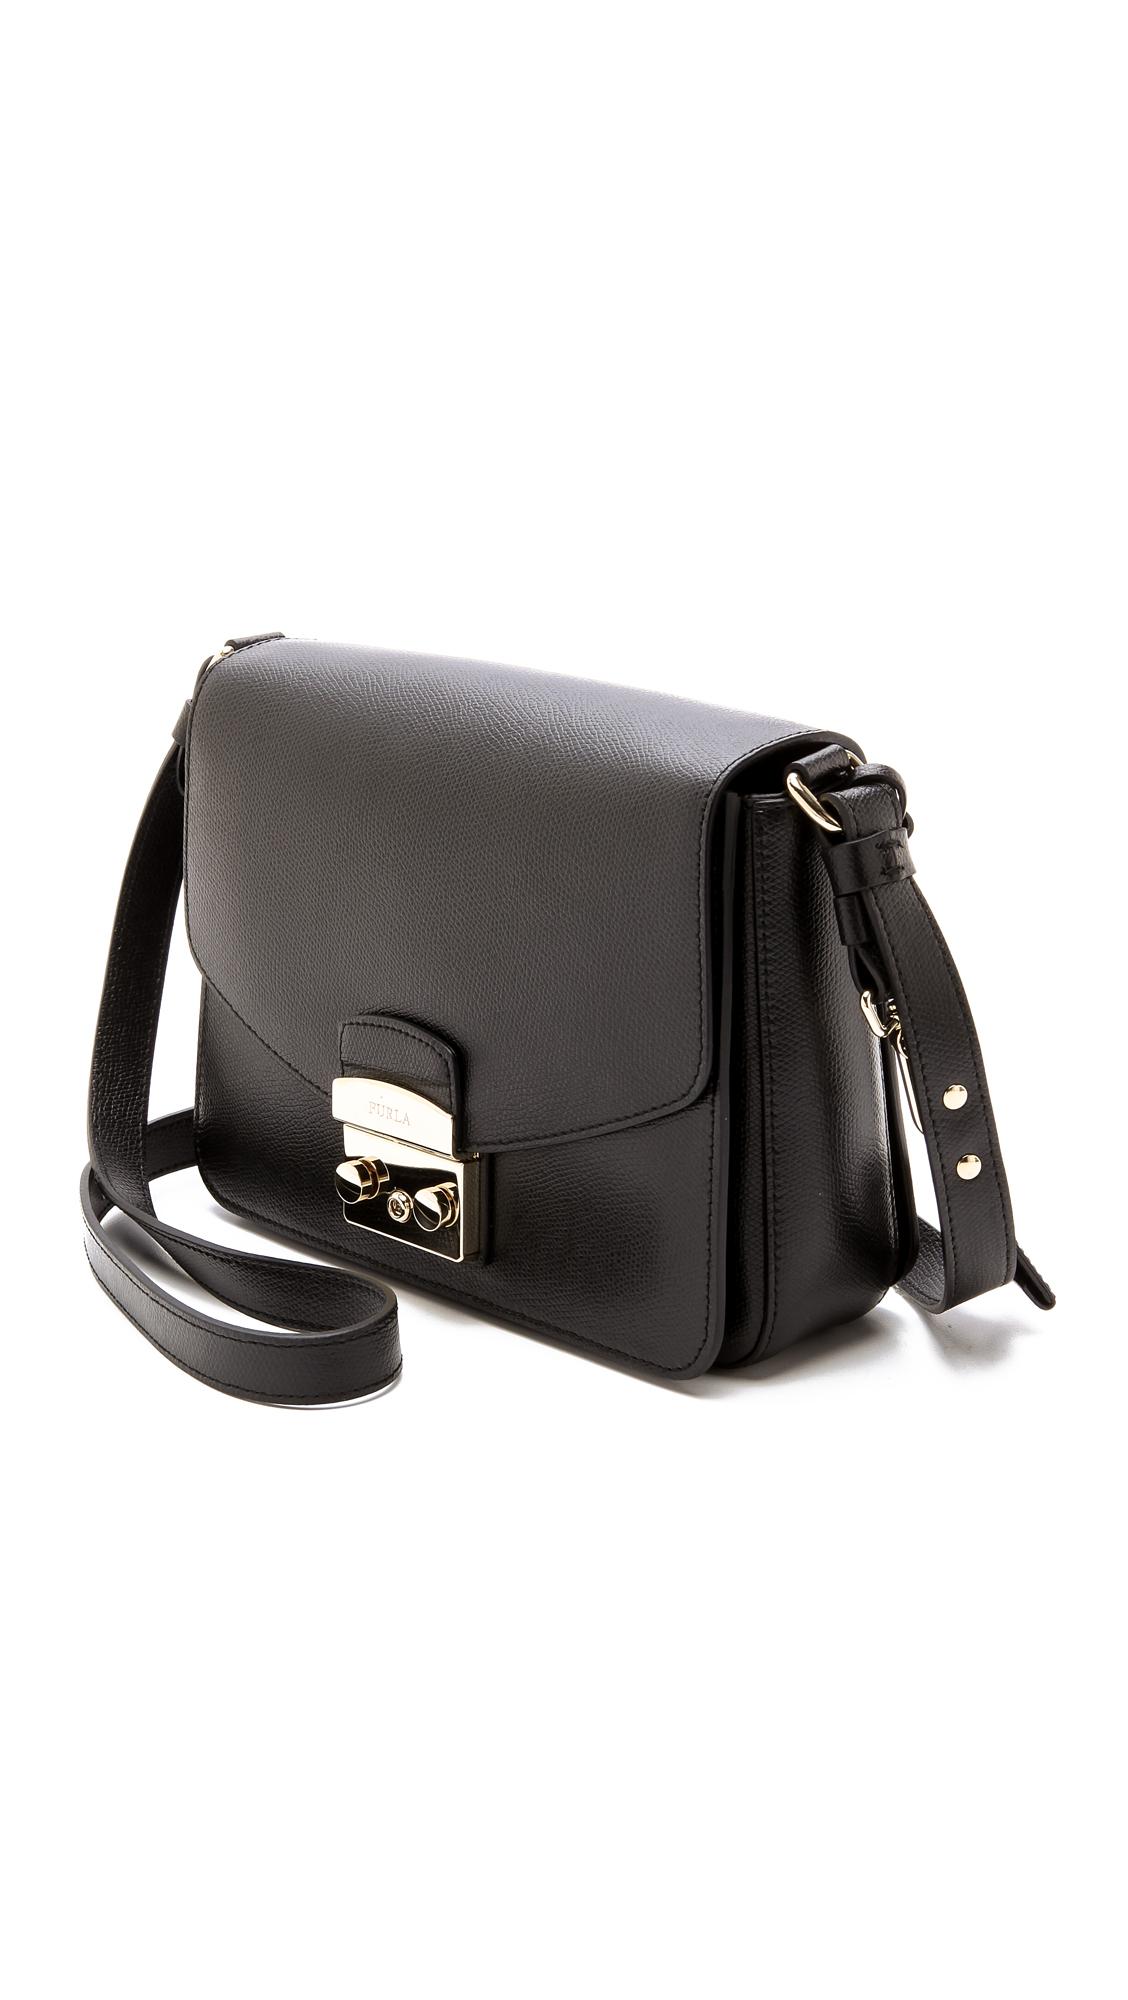 75bda553c5ce Furla Metropolis Shoulder Bag - Onyx in Black - Lyst